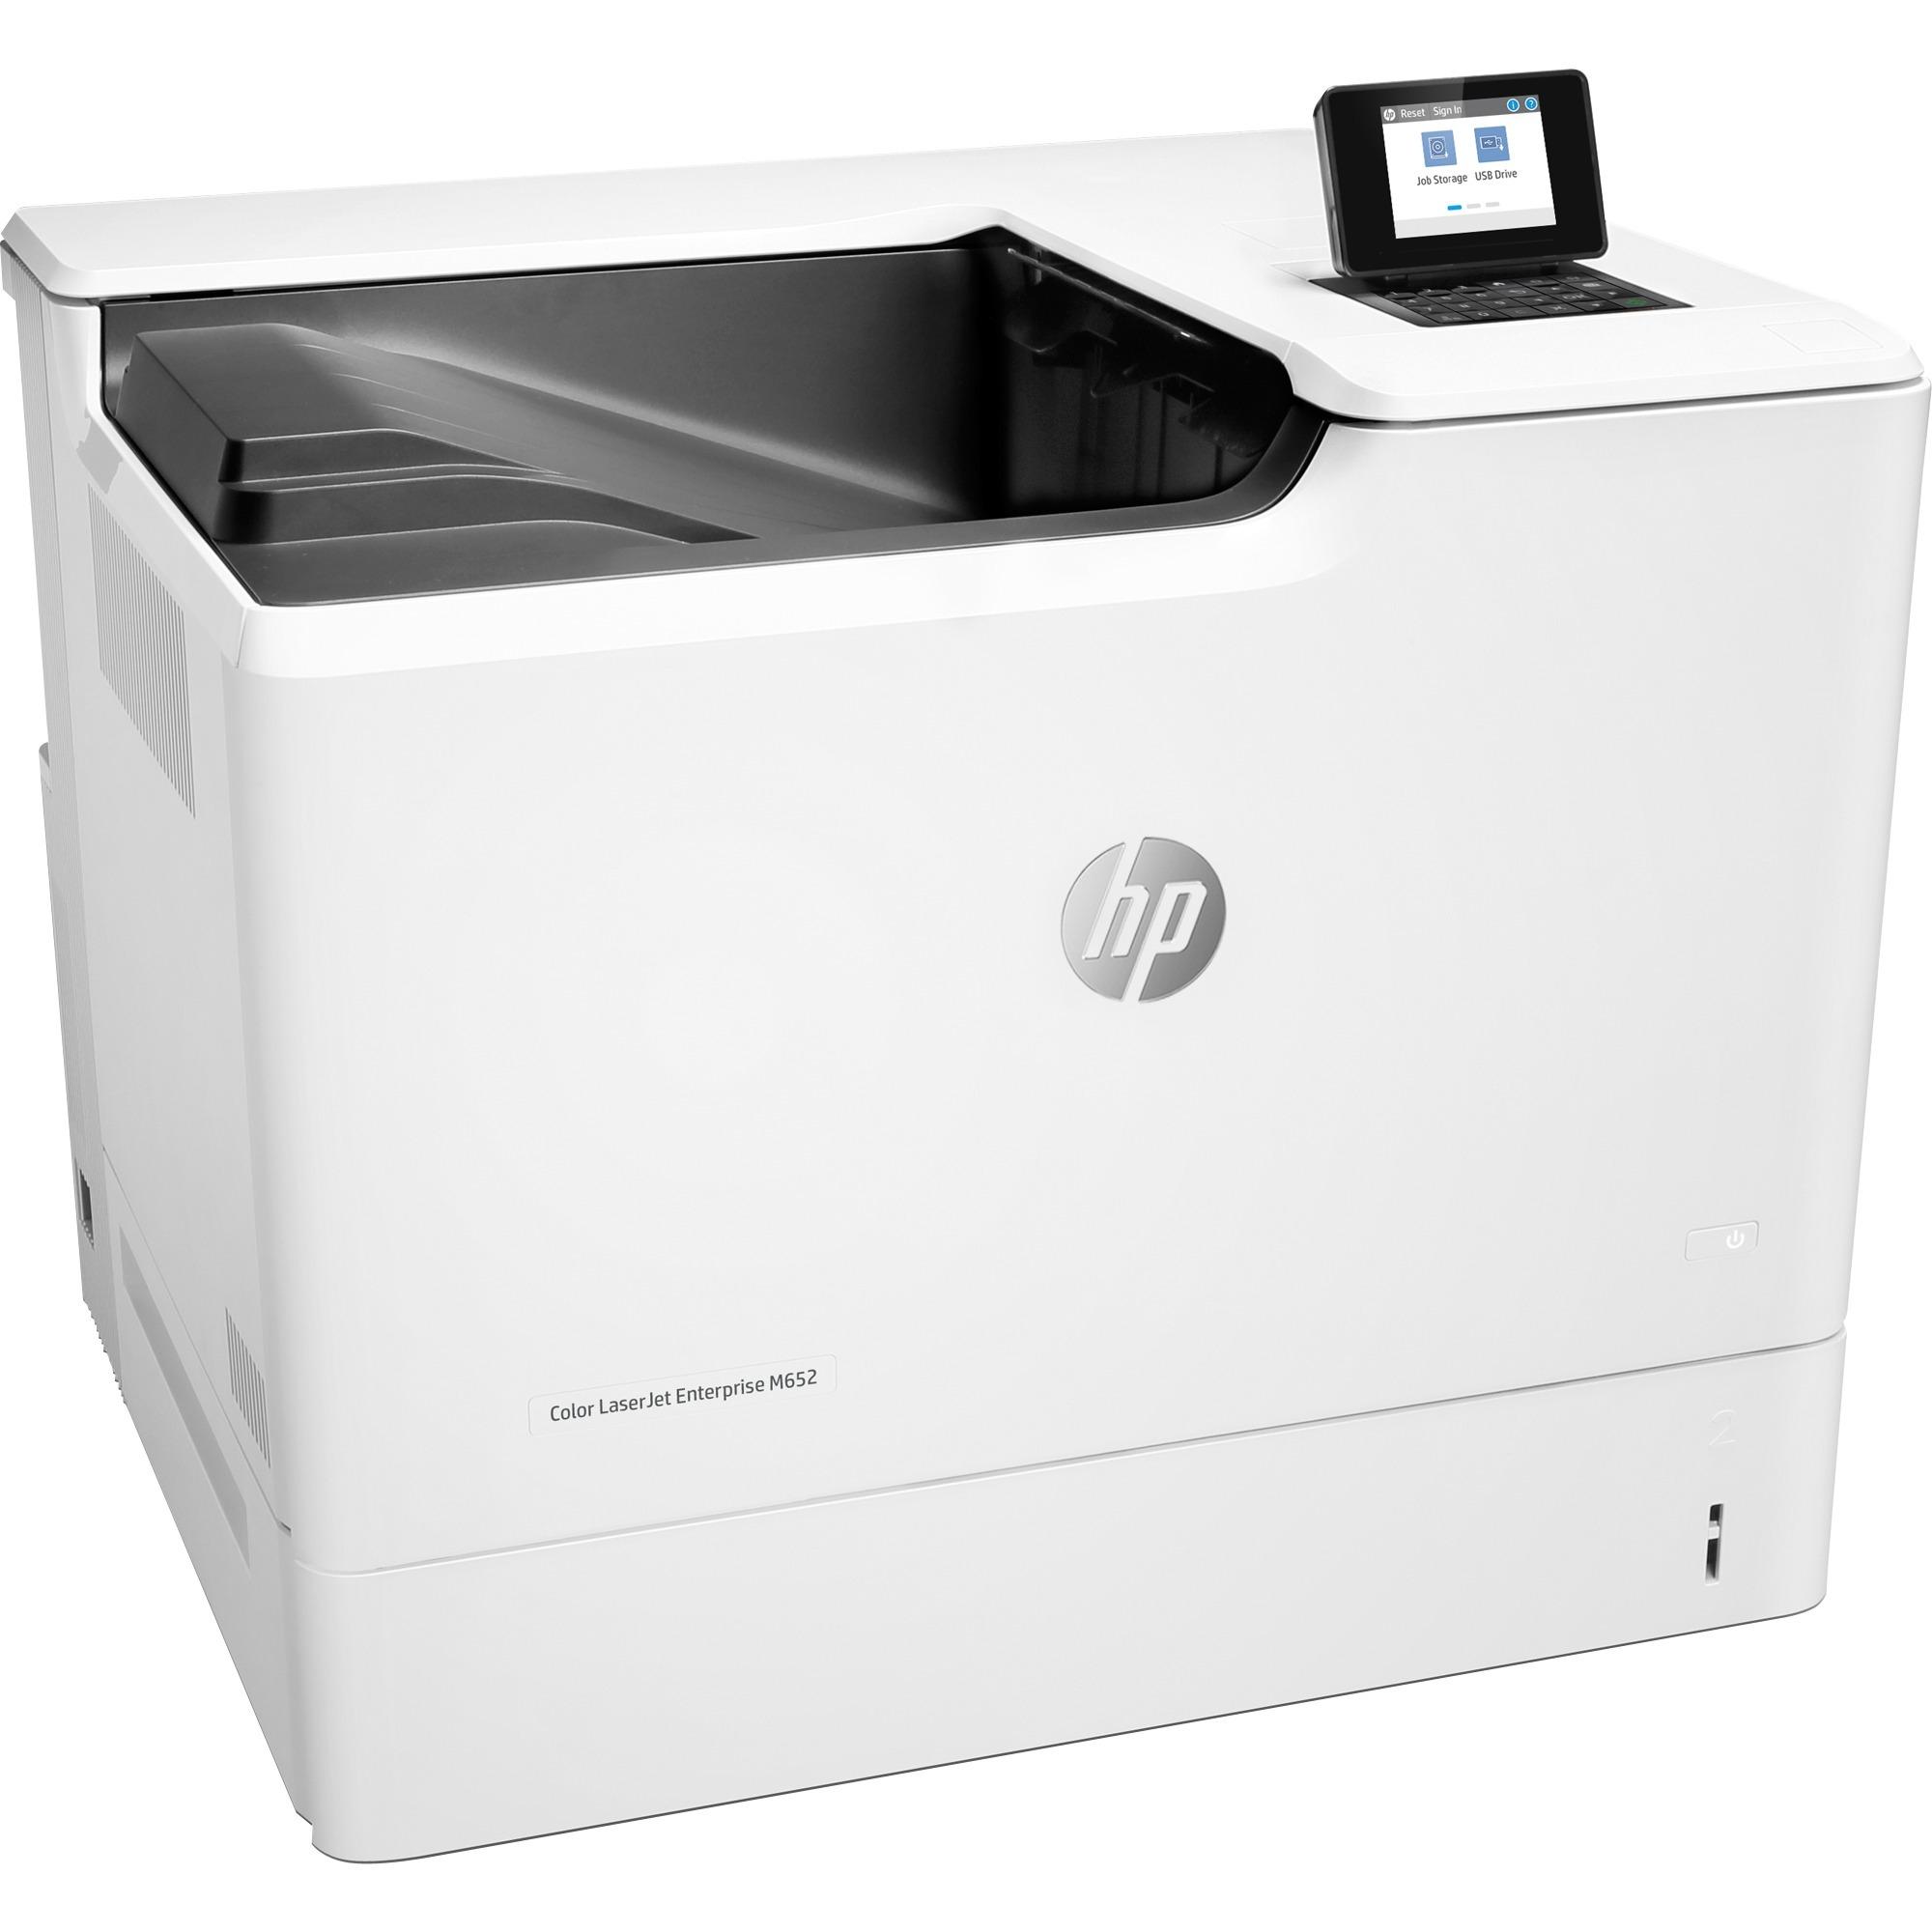 LaserJet Enterprise M652dn Color 1200 x 1200 DPI A4 Wifi, Impresora láser a color